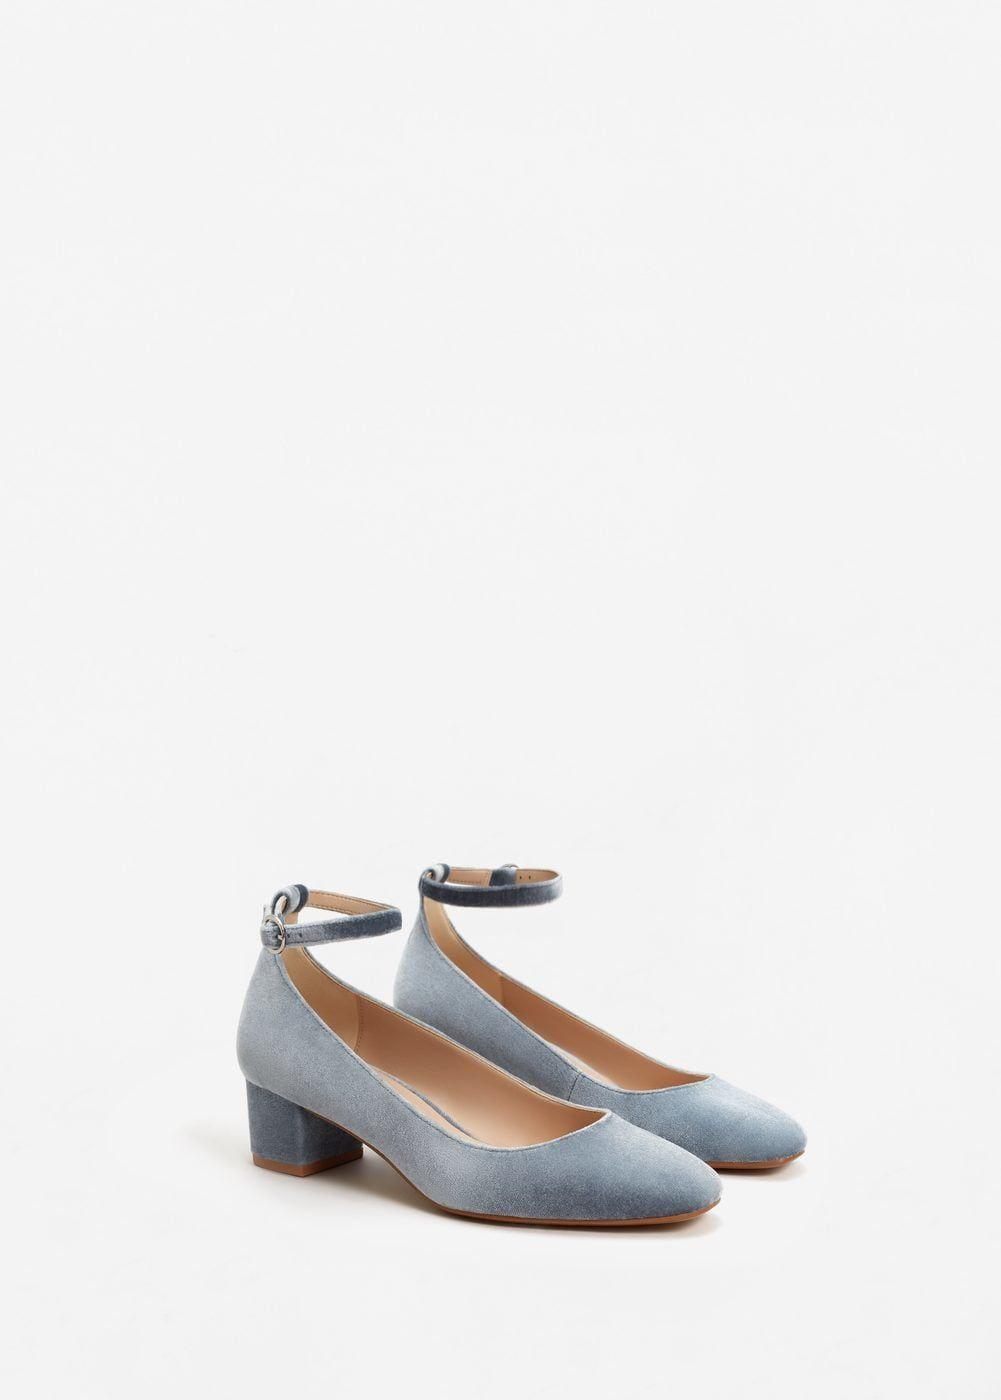 b08df207 Zapato terciopelo pulsera - Mujer | 2º PART SHOES | Zapatos, Zapatos ...